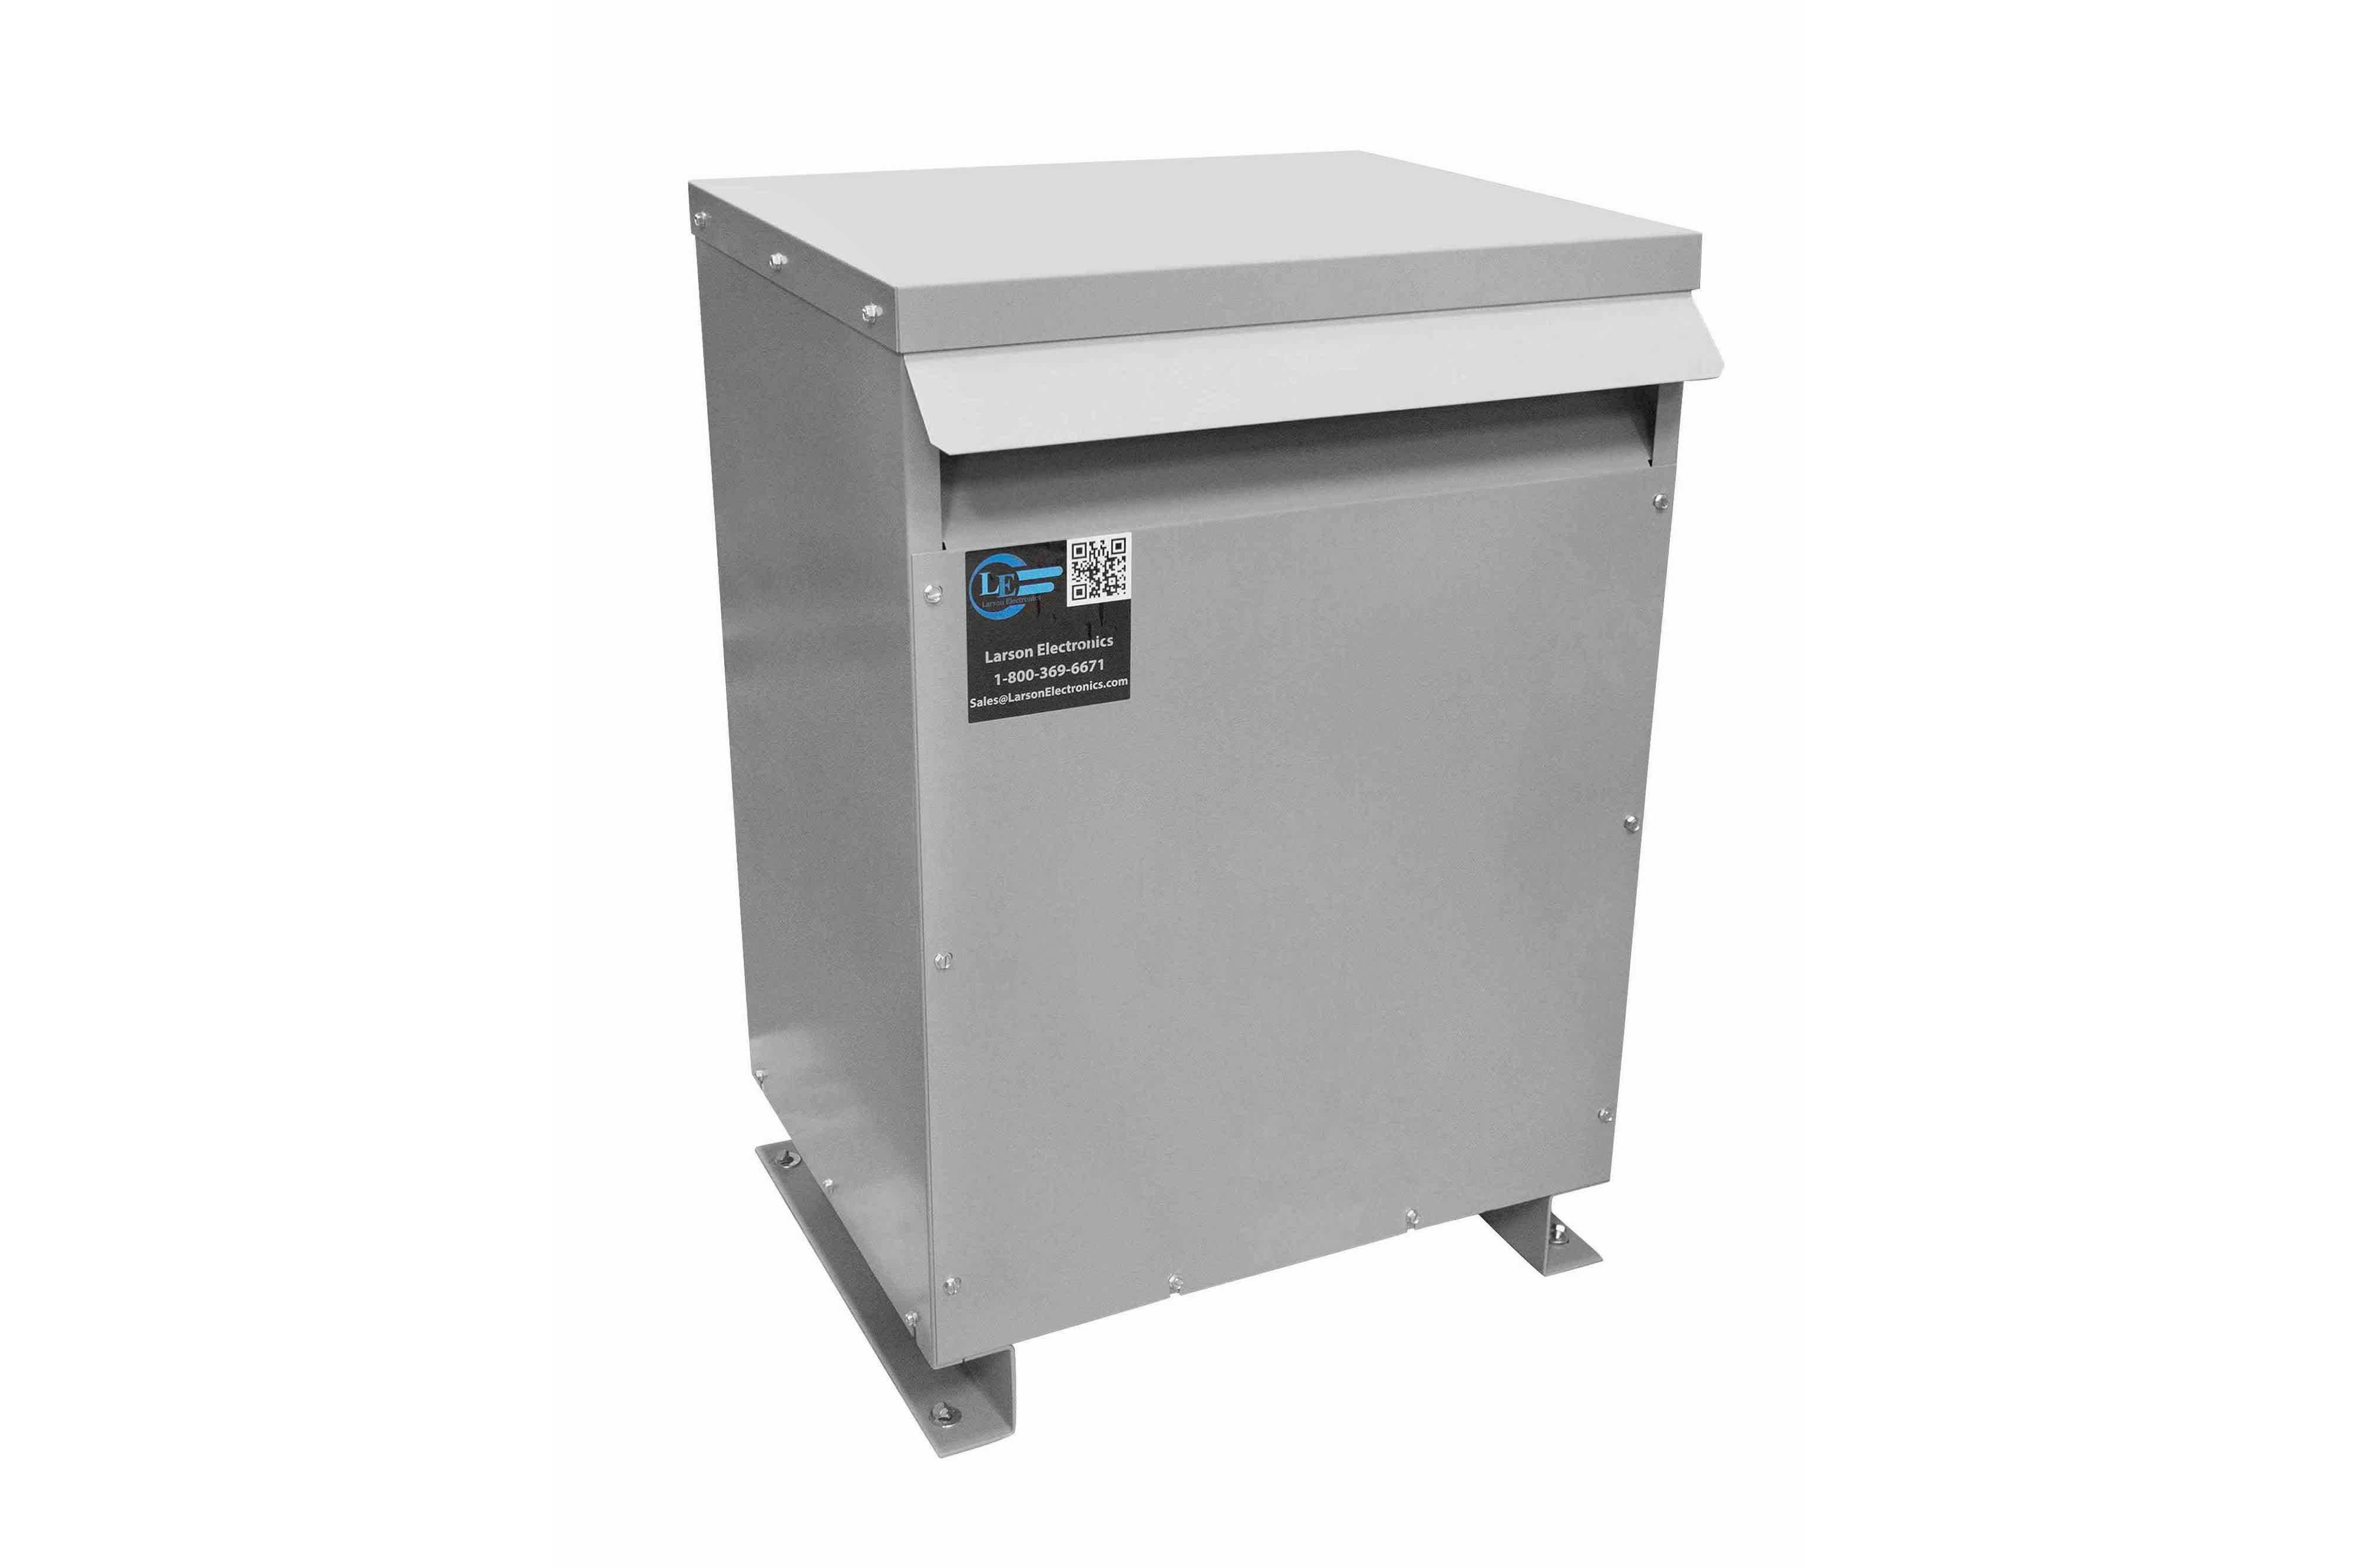 22.5 kVA 3PH Isolation Transformer, 480V Wye Primary, 575Y/332 Wye-N Secondary, N3R, Ventilated, 60 Hz